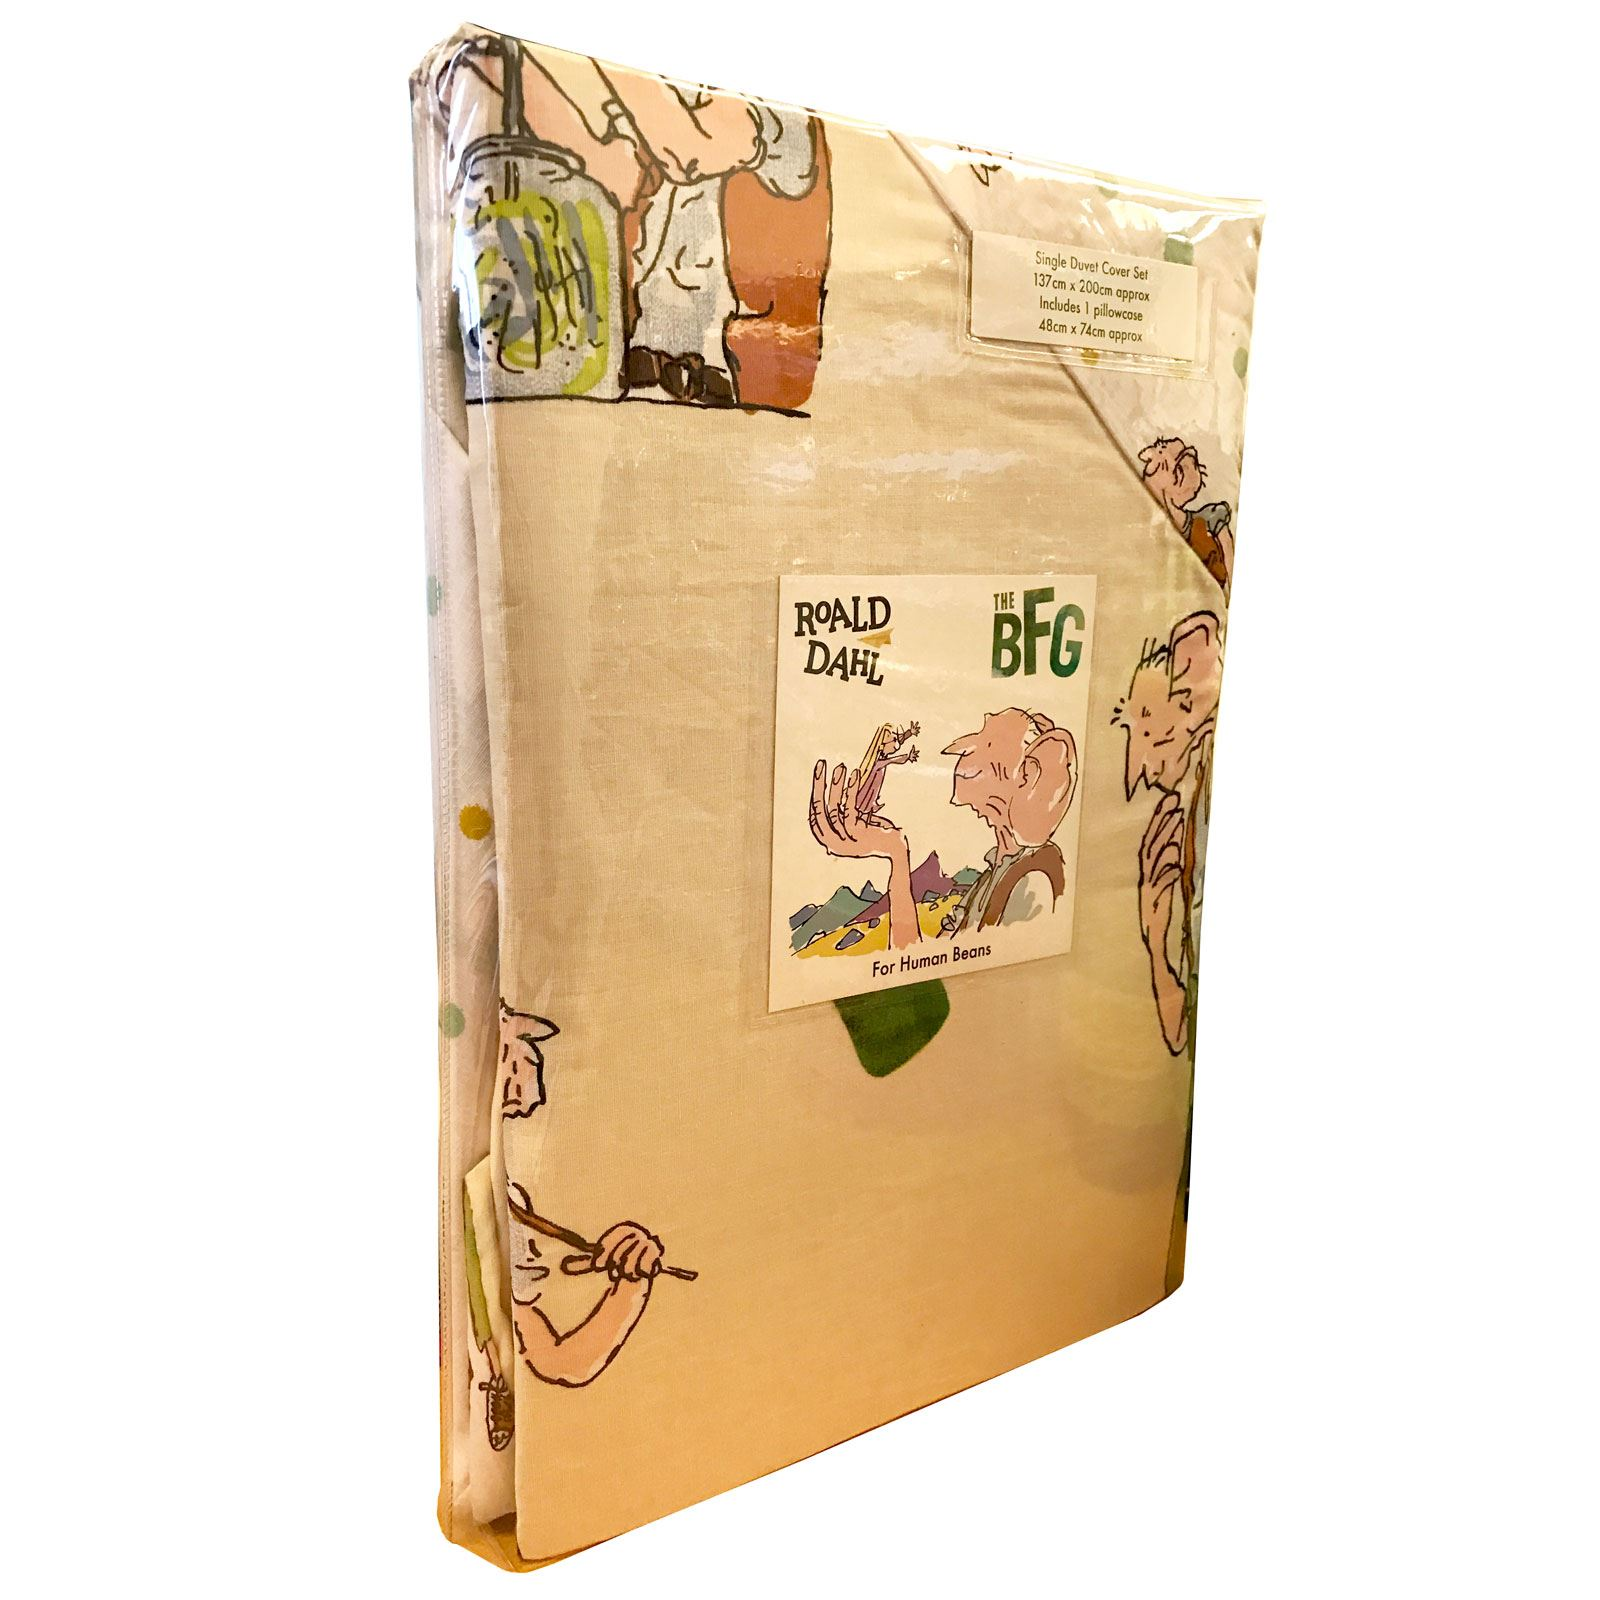 CHARACTER-AND-THEMED-SINGLE-DUVET-COVER-KIDS-BEDDING-SETS-AVENGERS-KITTY-UNICORN thumbnail 145